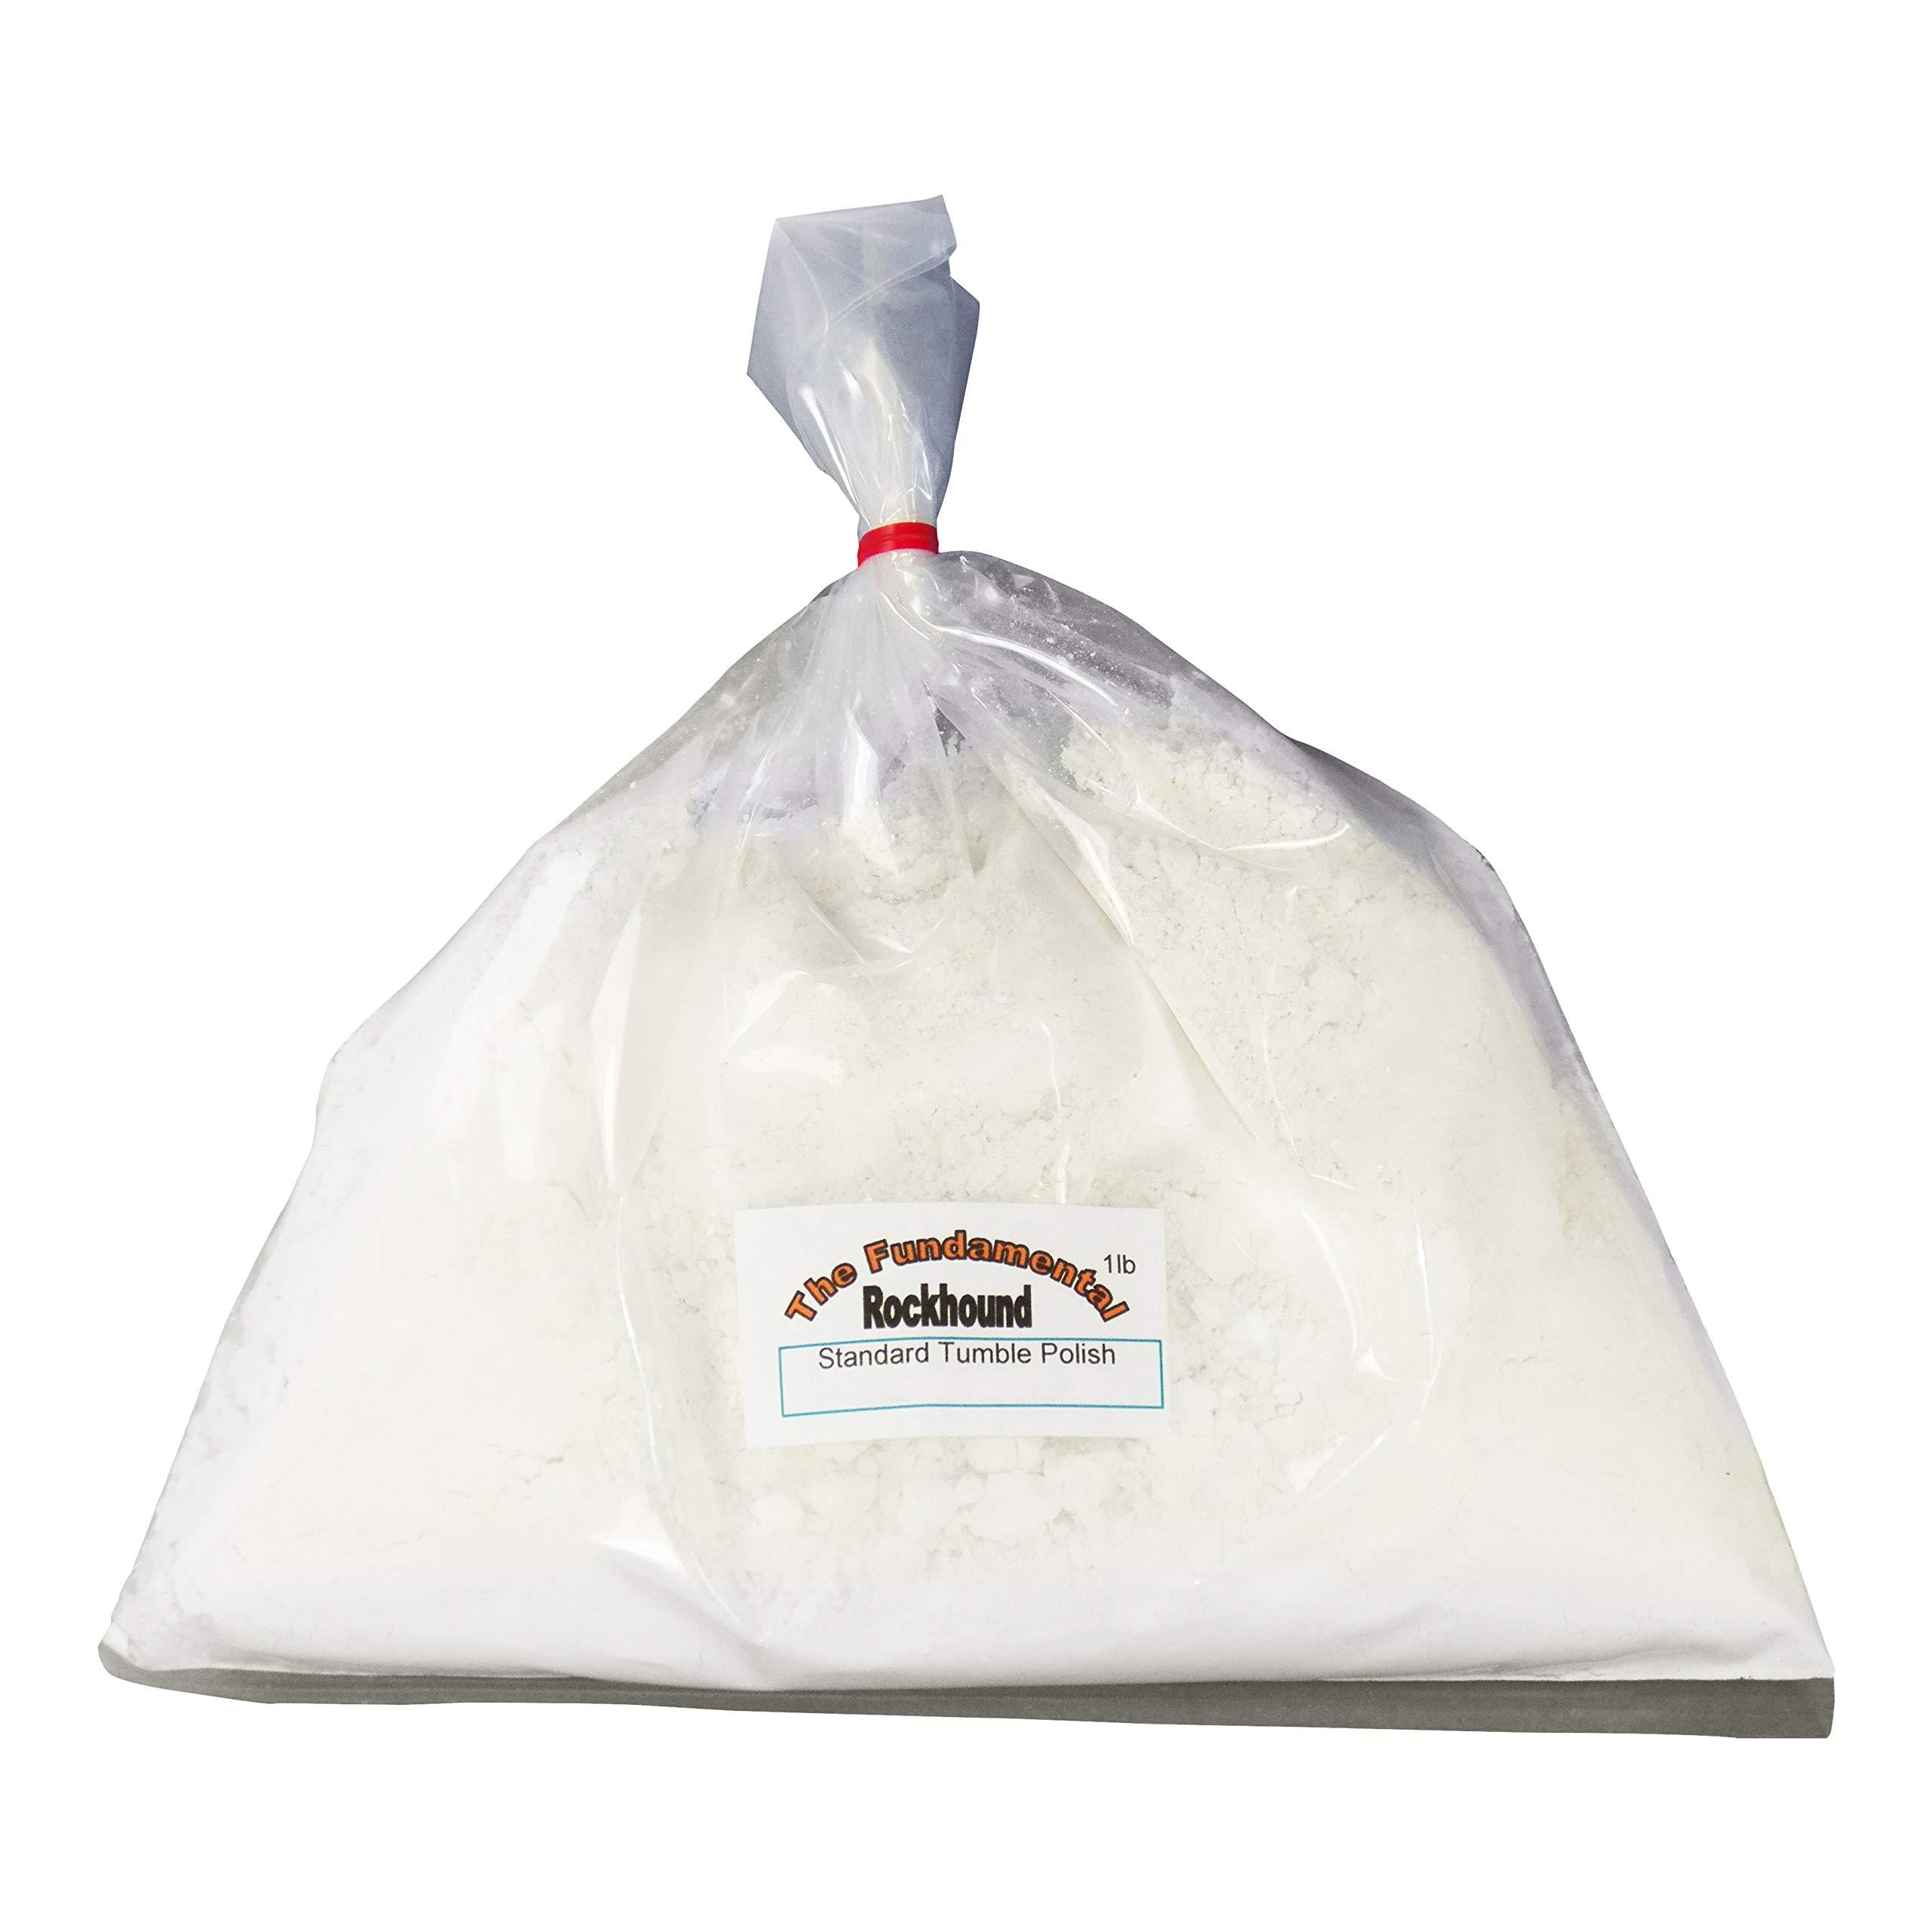 Fundamental Rockhound Products: Standard Aluminum Oxide Tumble Polish for Rocks and Glass (3 lb)